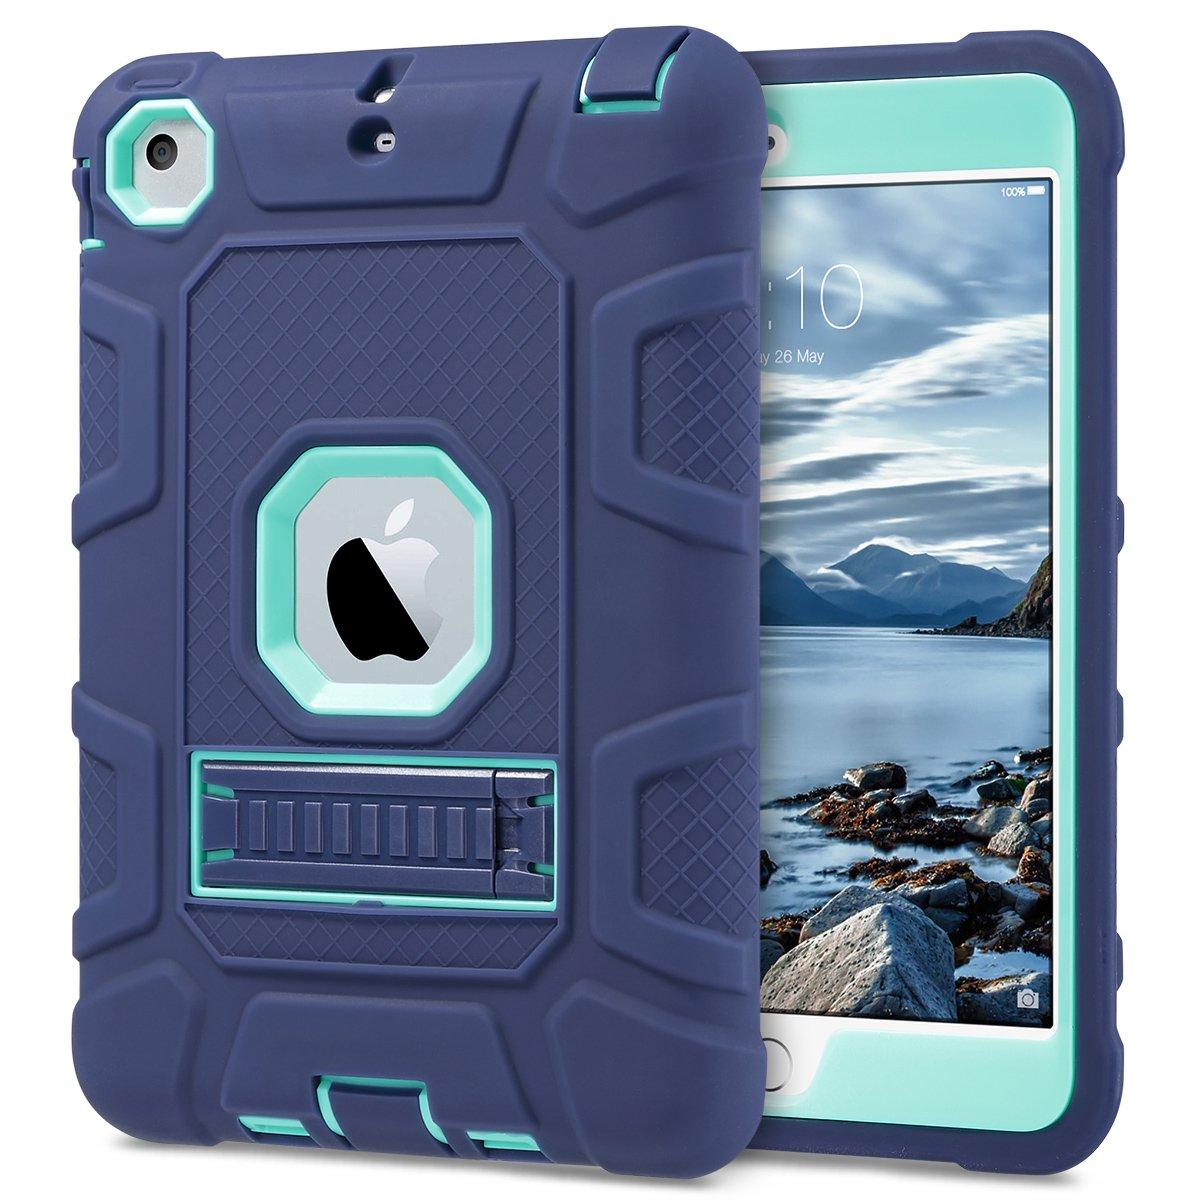 Negro+Negro iPad Mini 2 // Mini 3 Funda Carcasa 3en1 H/íbrido Resistente a Prueba de Golpes Kickstand Robusto Caso para iPad Mini 1 // iPad Mini 2 // iPad Mini 3 ULAK iPad Mini Caso